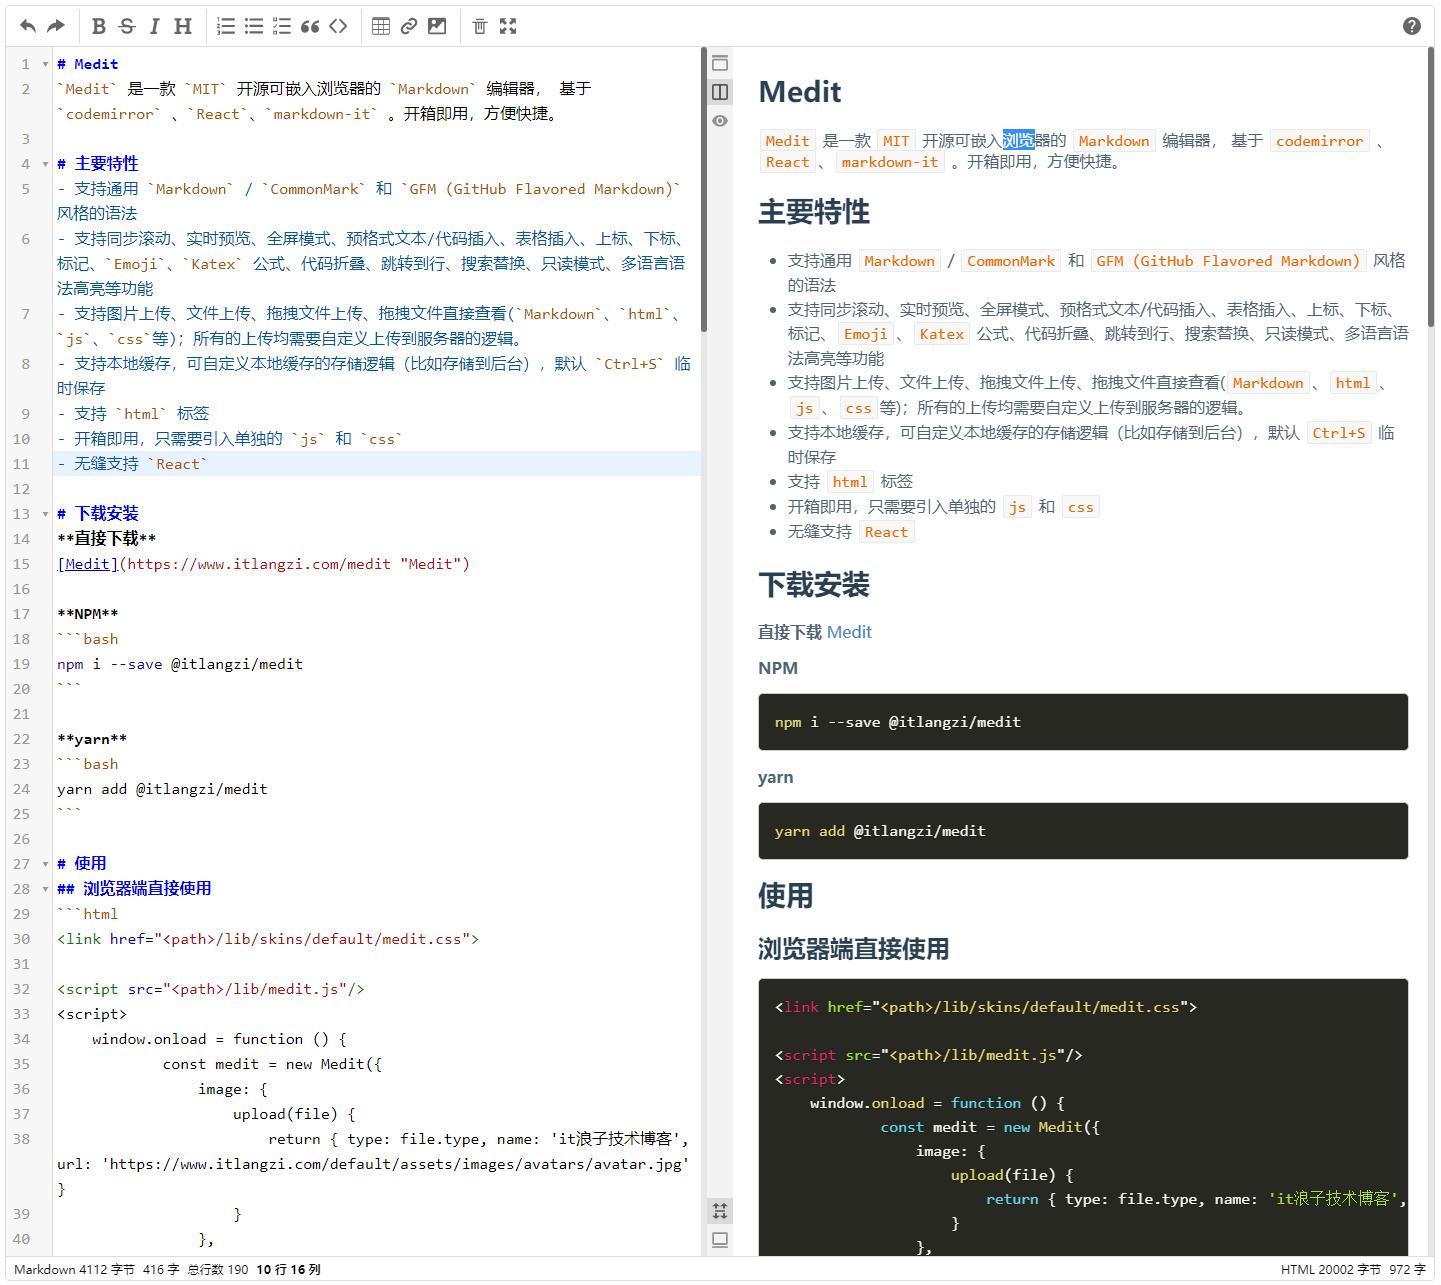 Medit 可能是最方便好用的浏览器Markdown编辑器